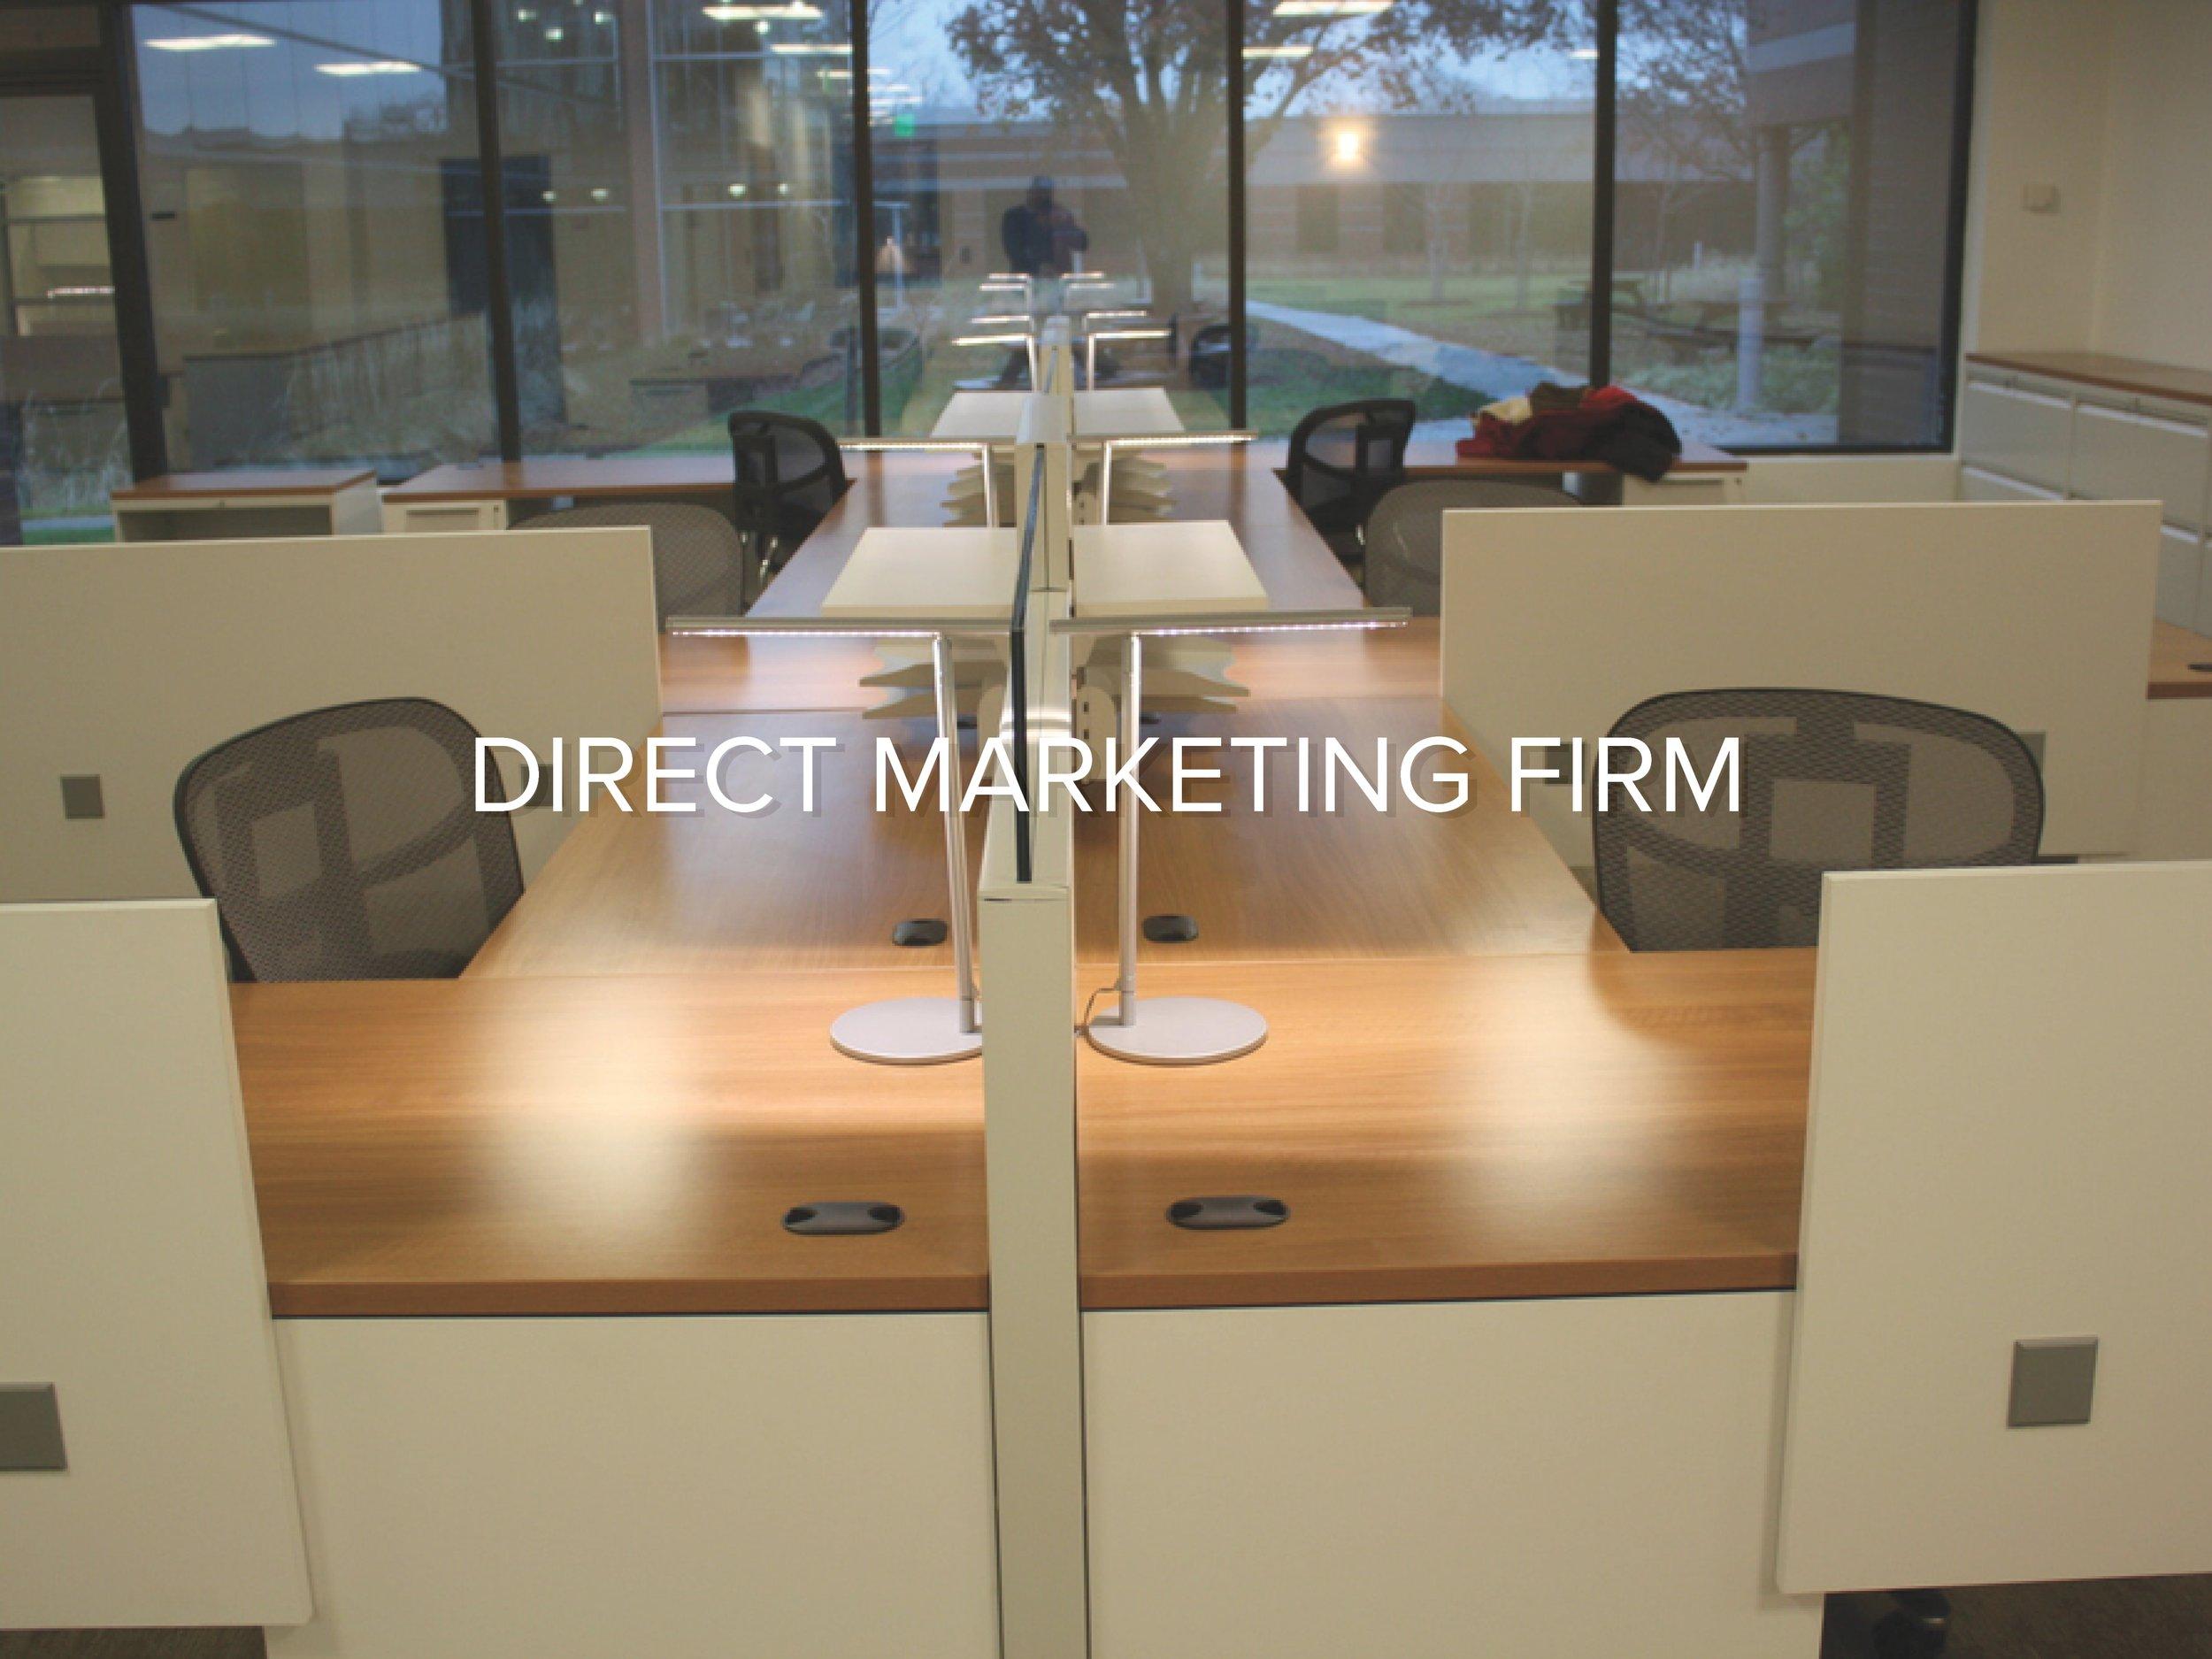 Direct Marketing Firm.jpg